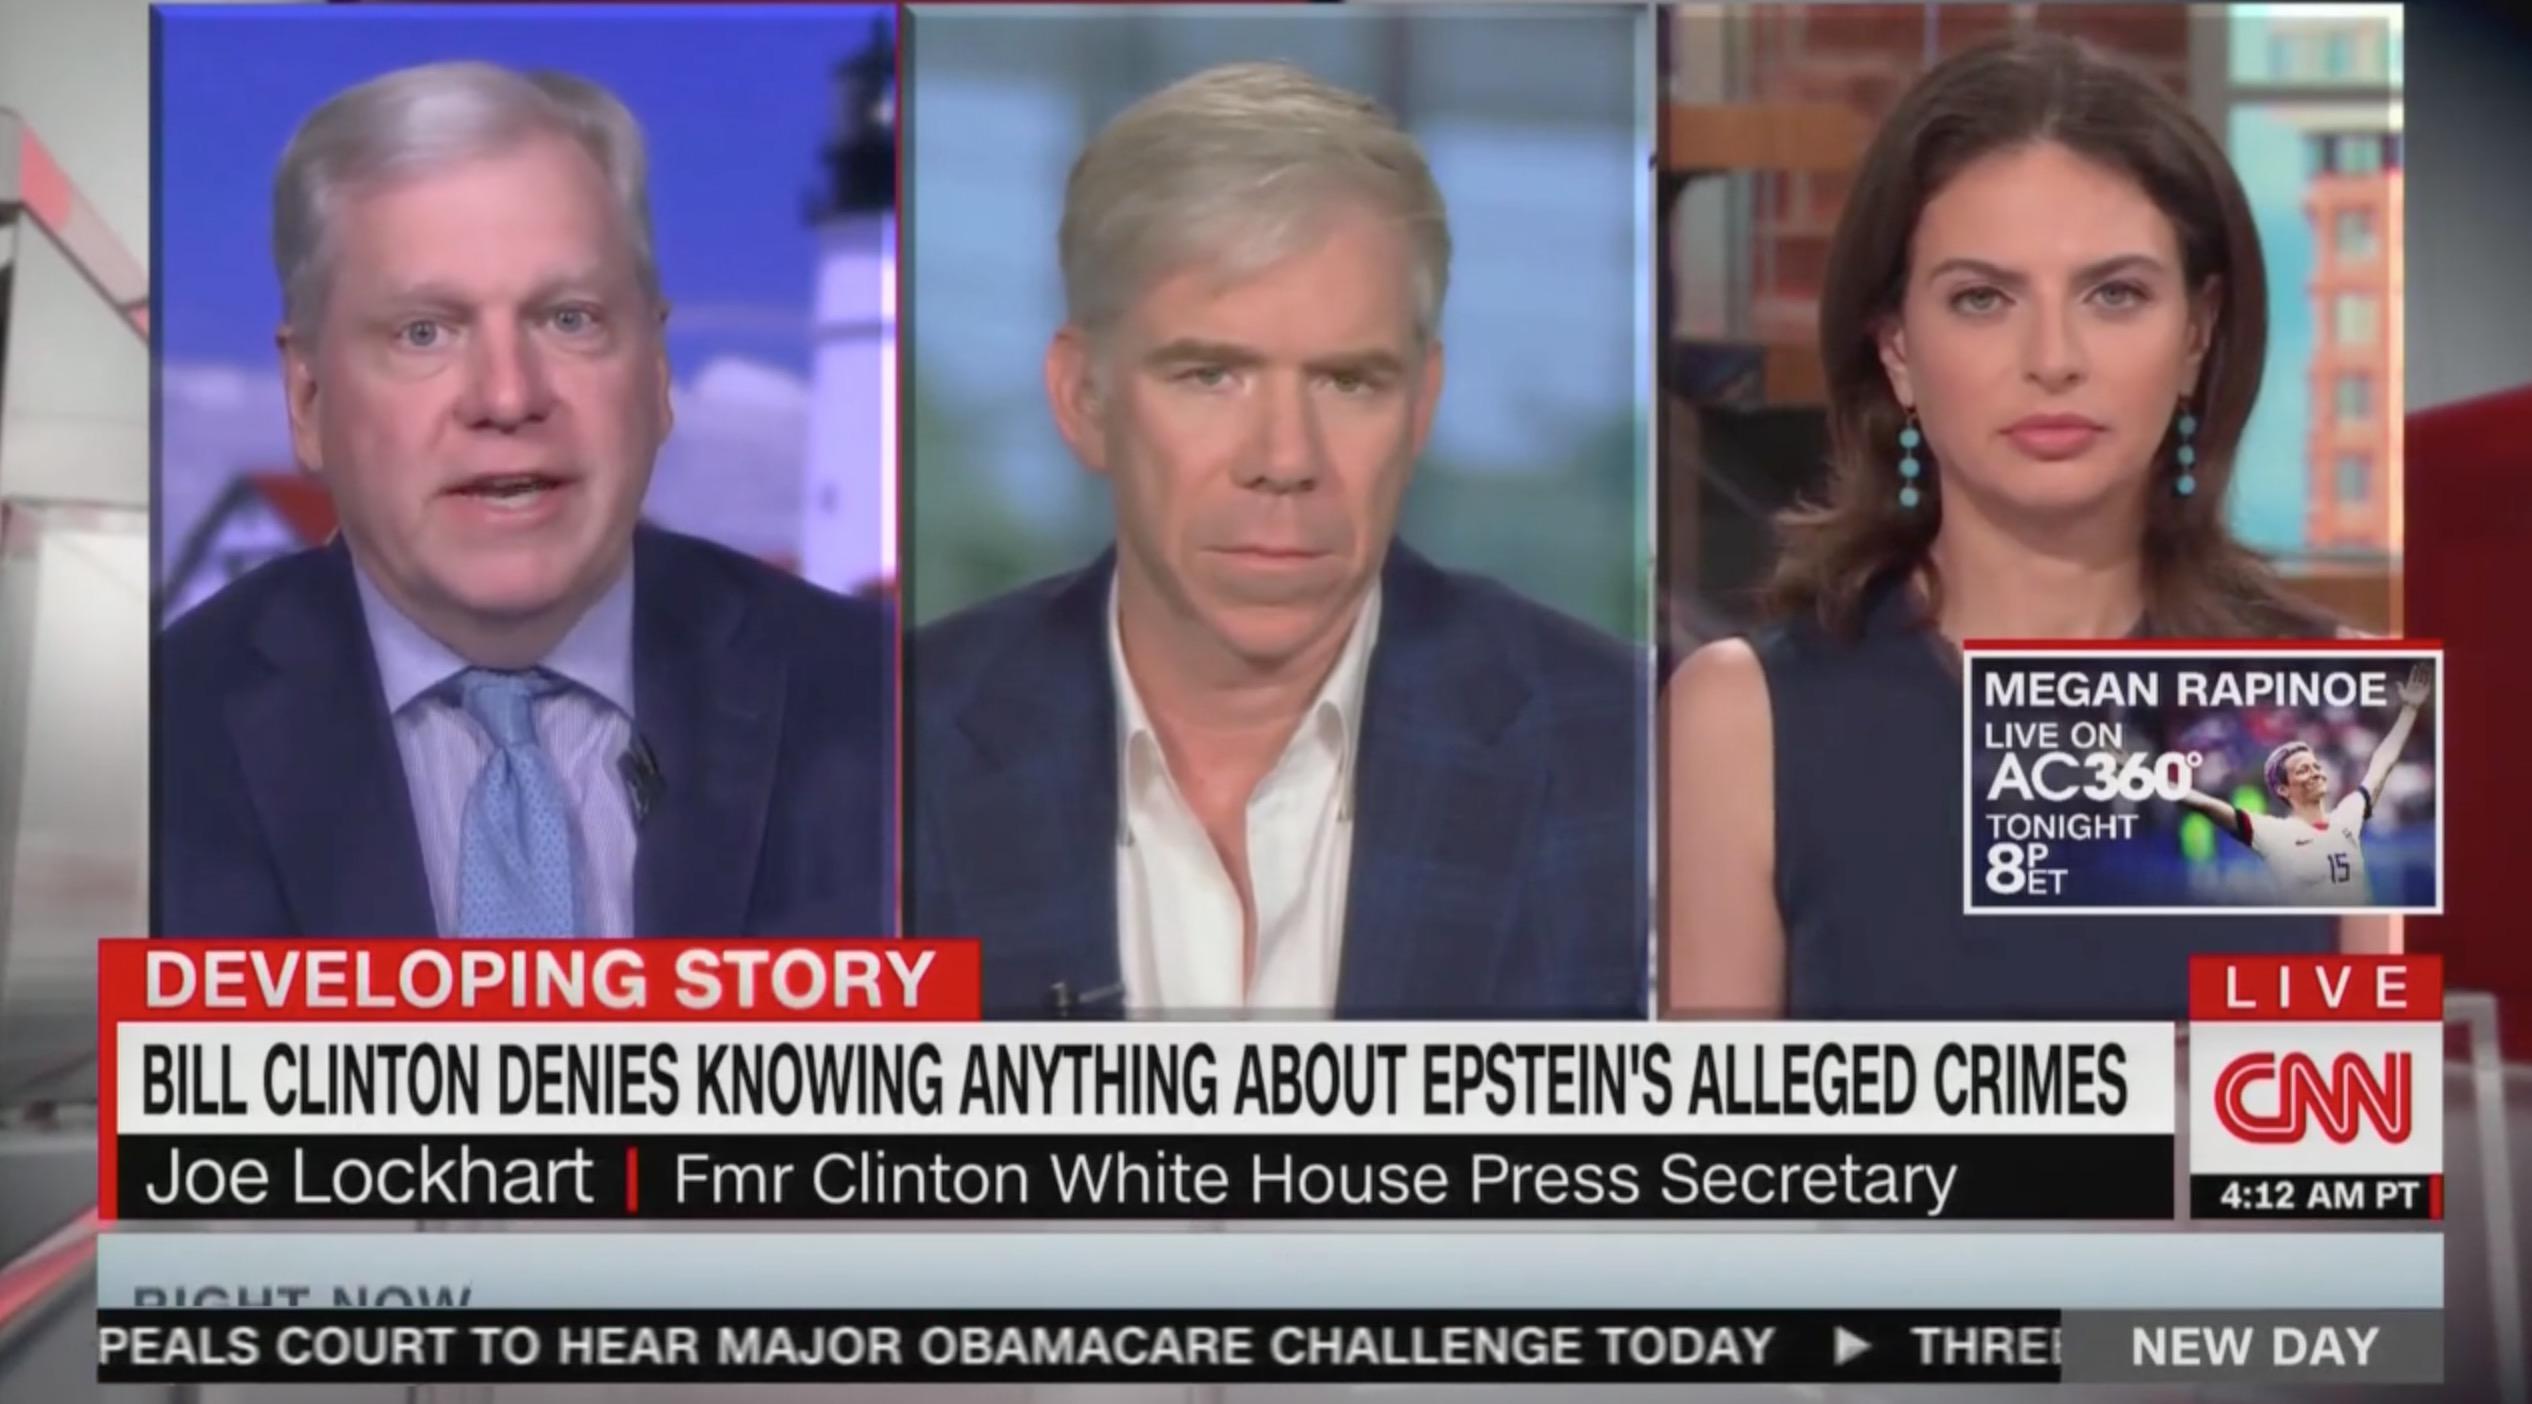 Joe Lockhart Claims Jeffrey Epstein Wasn't Part of 'the Clinton Circle' Before Pivoting to Labor Sec Acosta